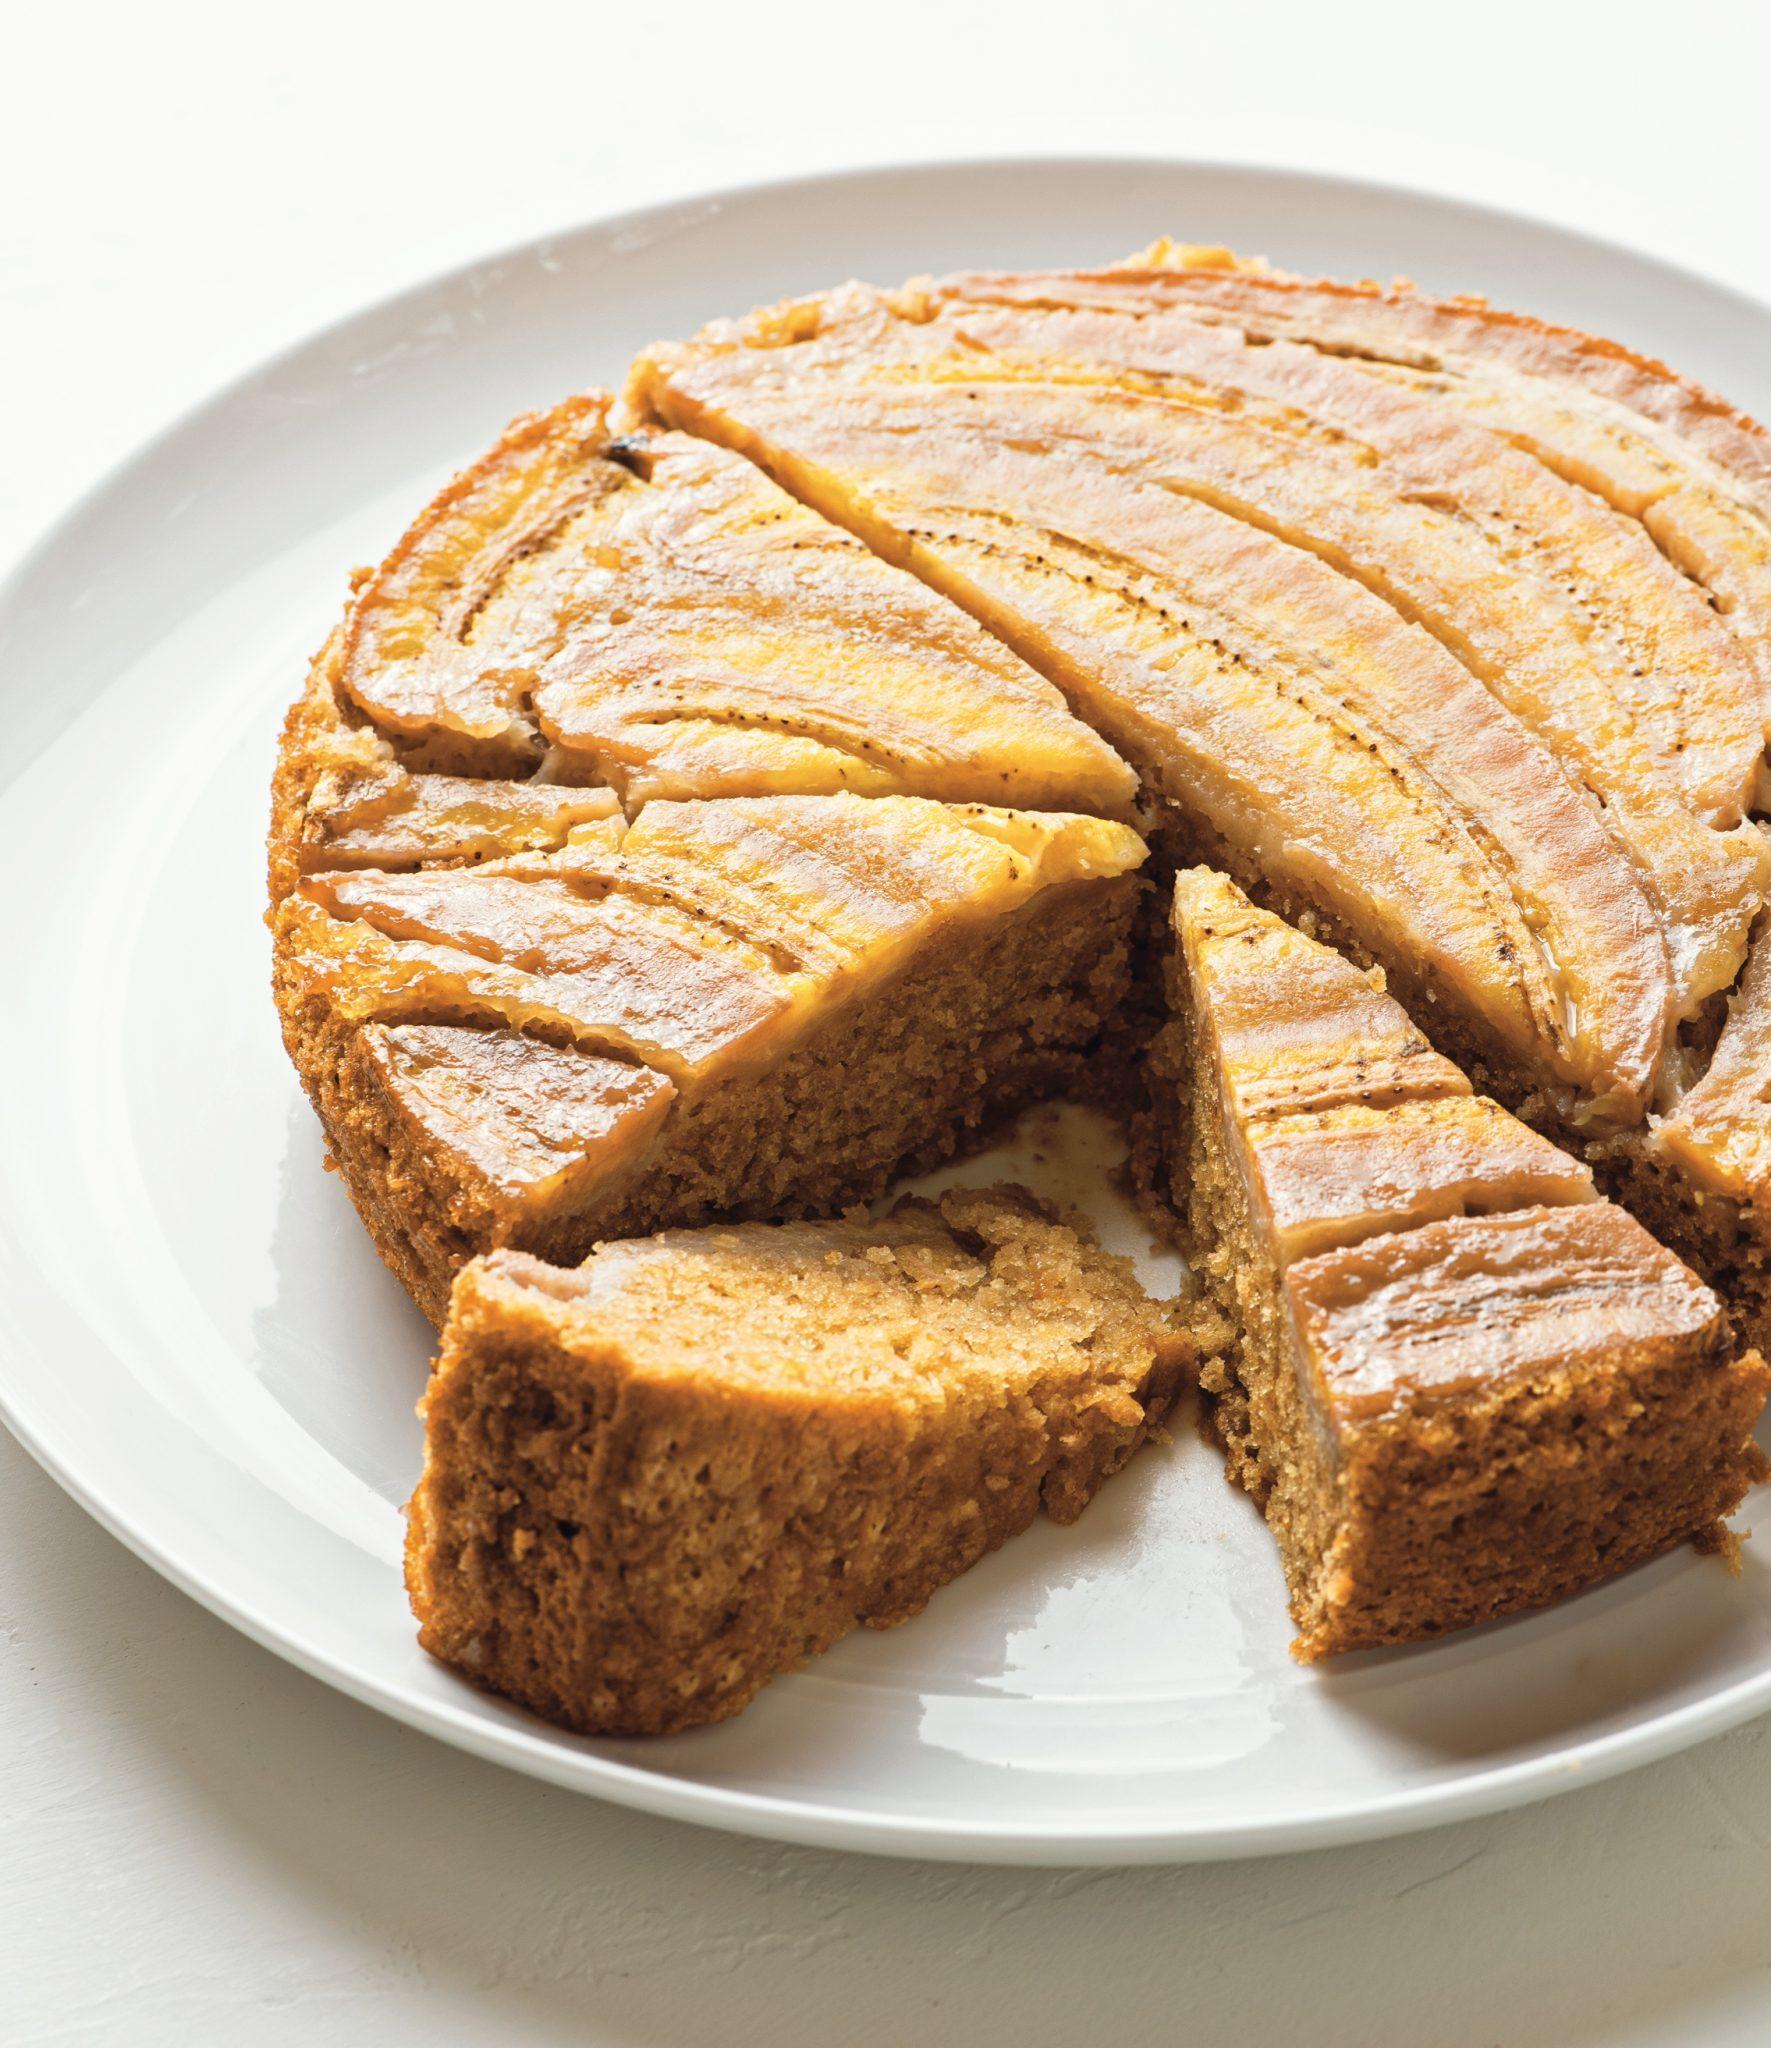 Vegan Banana-Caramel Upside-Down Cake